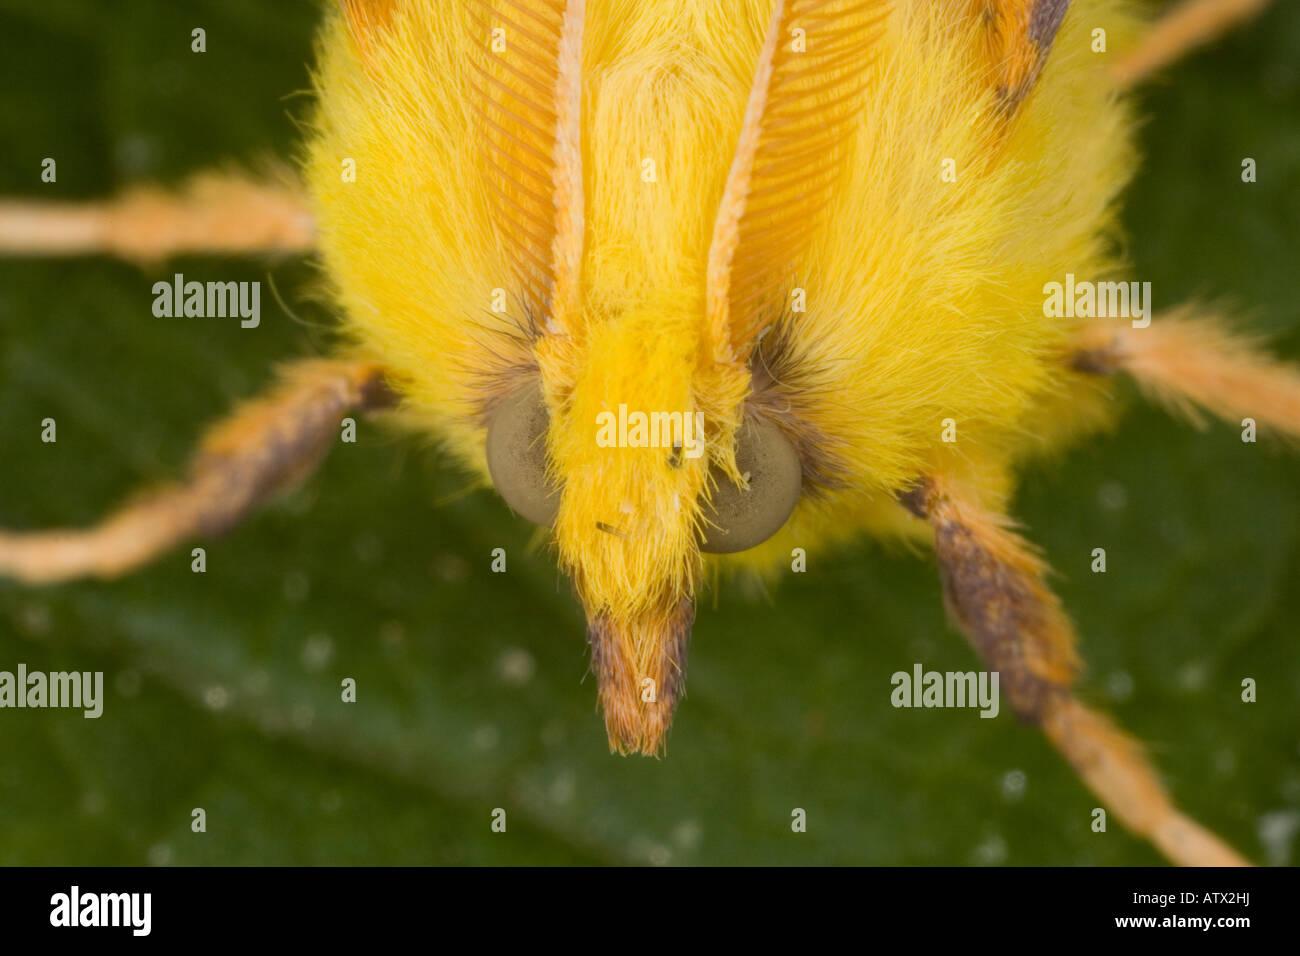 Kanarischen geschultert Thorn Motte (Ennomos Alniaria) hautnah, Dorset, England, UK Stockbild